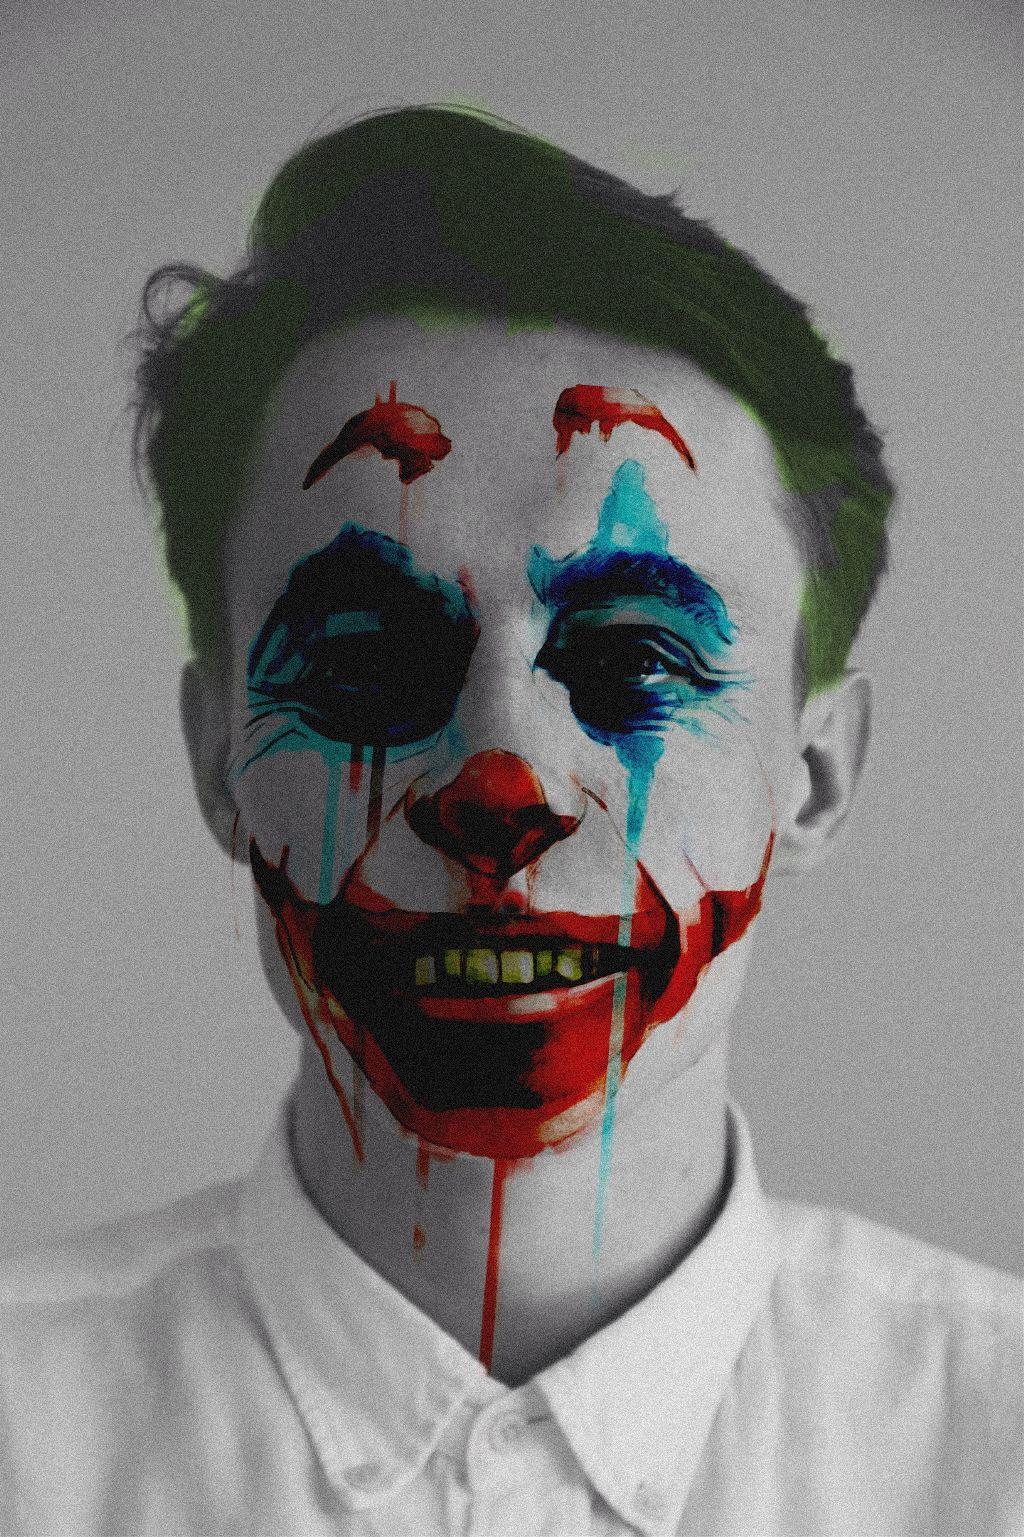 #freetoedit #jokerface #jokersmile  #doublexposure #madewithpicsart #myedit @picsart 🎭